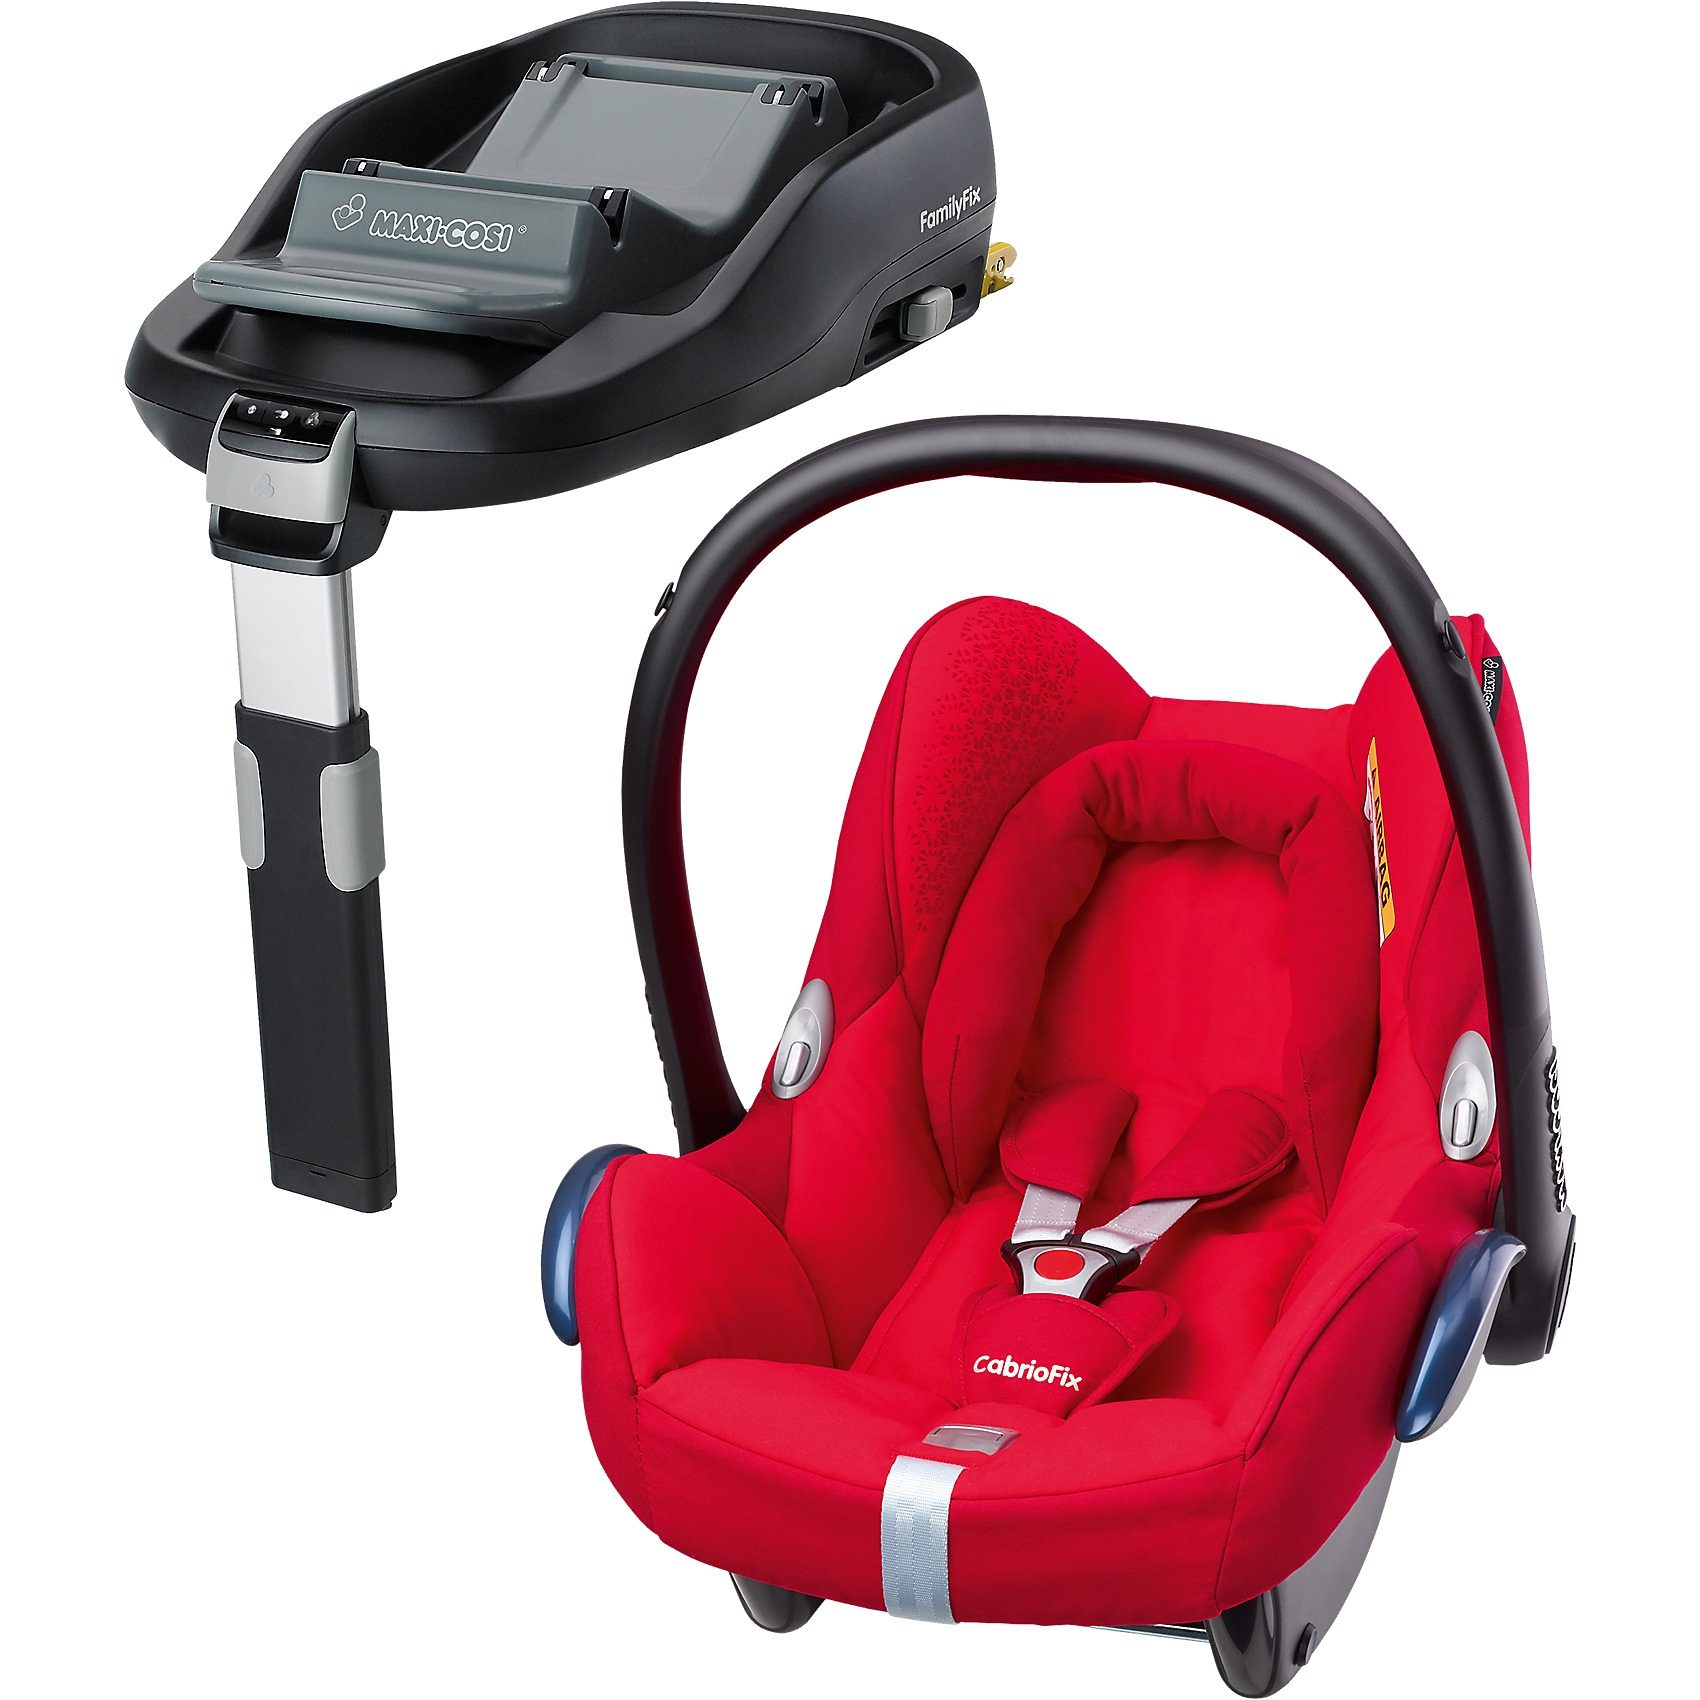 Maxi-Cosi Babyschale Cabriofix, origami red, inkl. FamilyFix